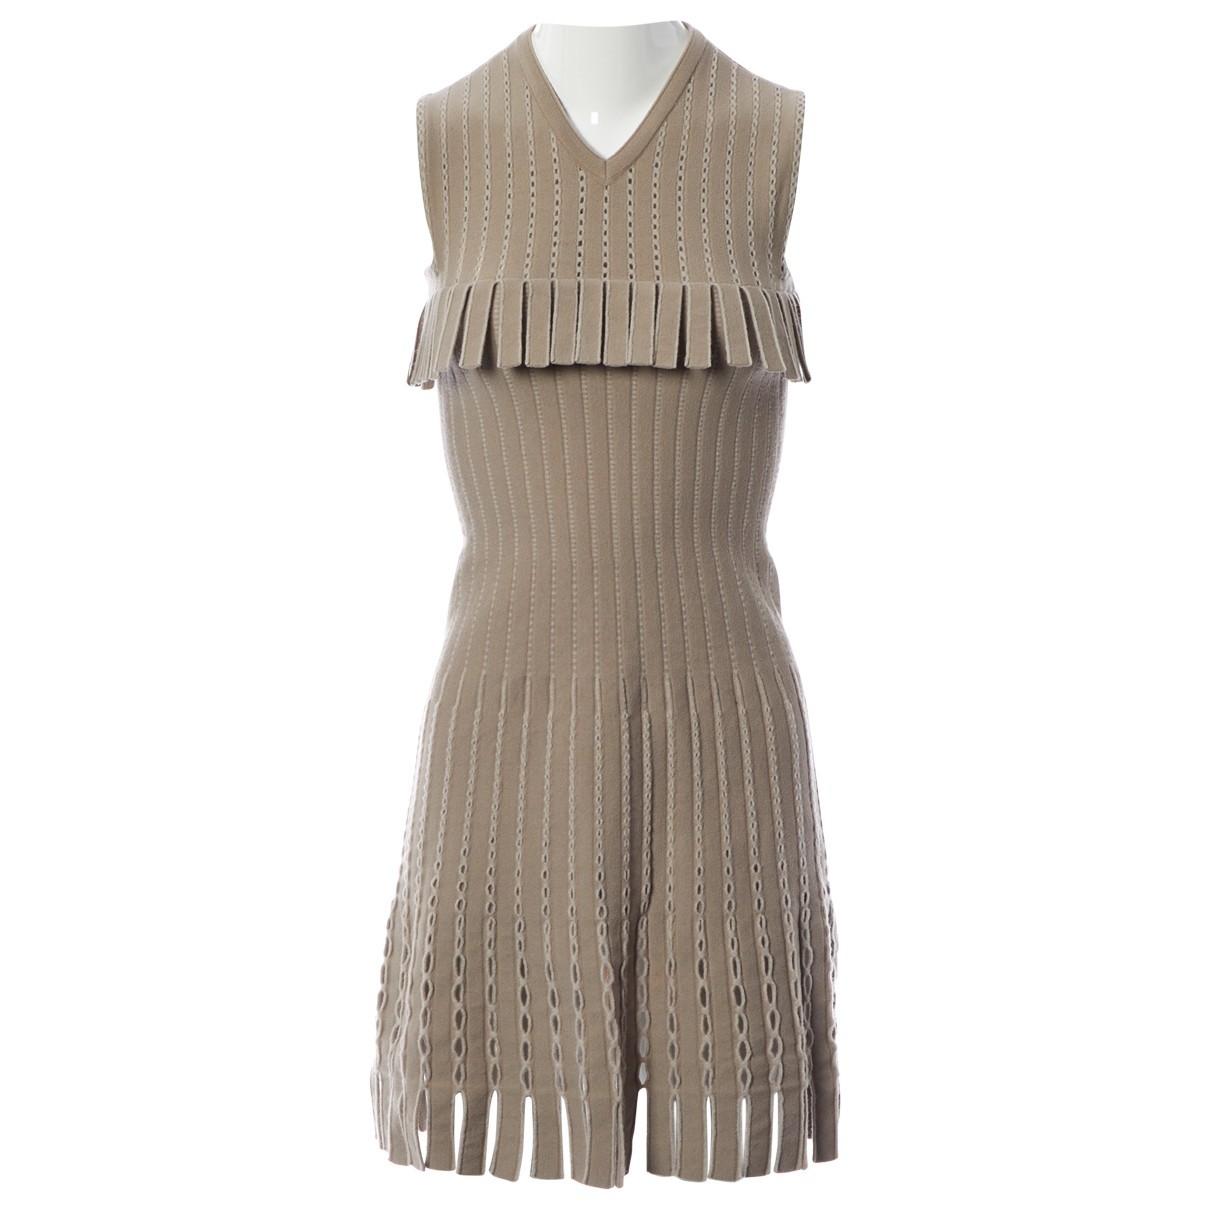 Alaïa \N Ecru Wool dress for Women 38 FR